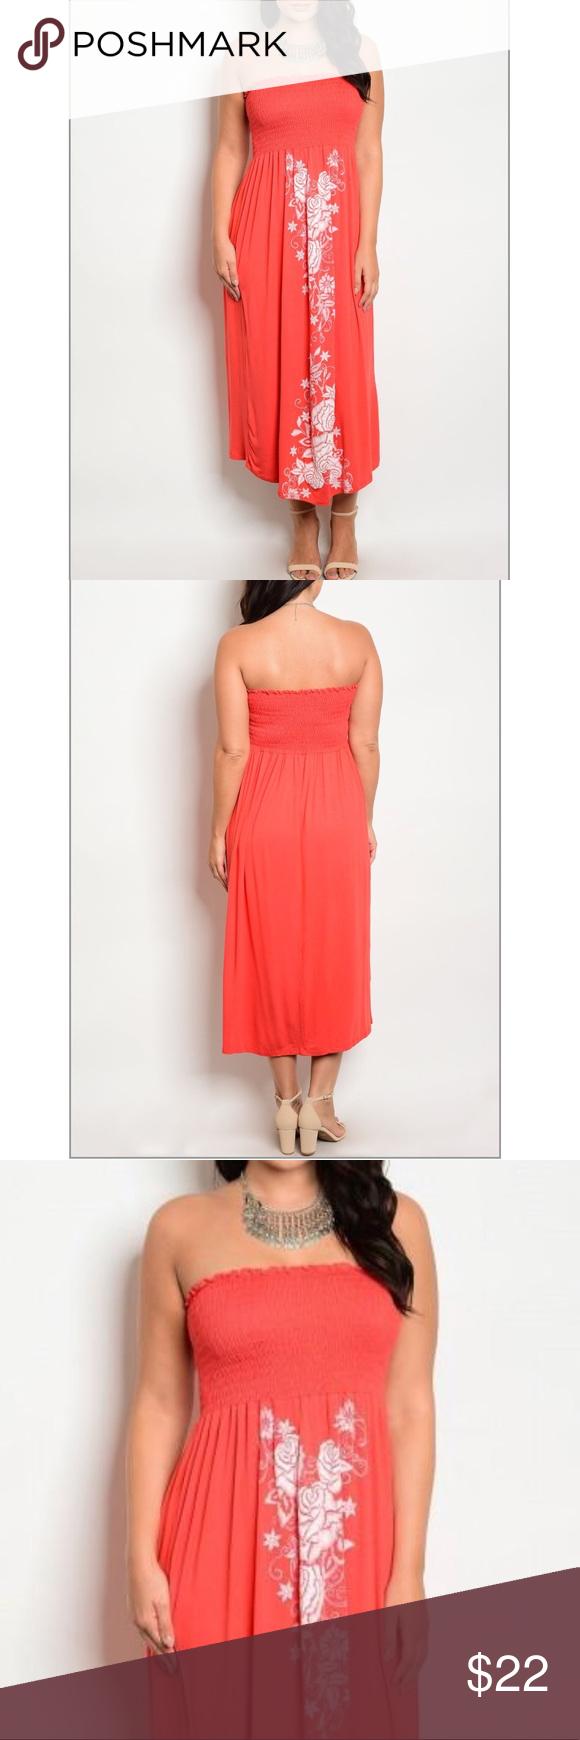 2x 2xl Plus Size Floral Print Smocked Maxi Dress Smocked Maxi Dresses Dresses Clothes Design [ 1740 x 580 Pixel ]